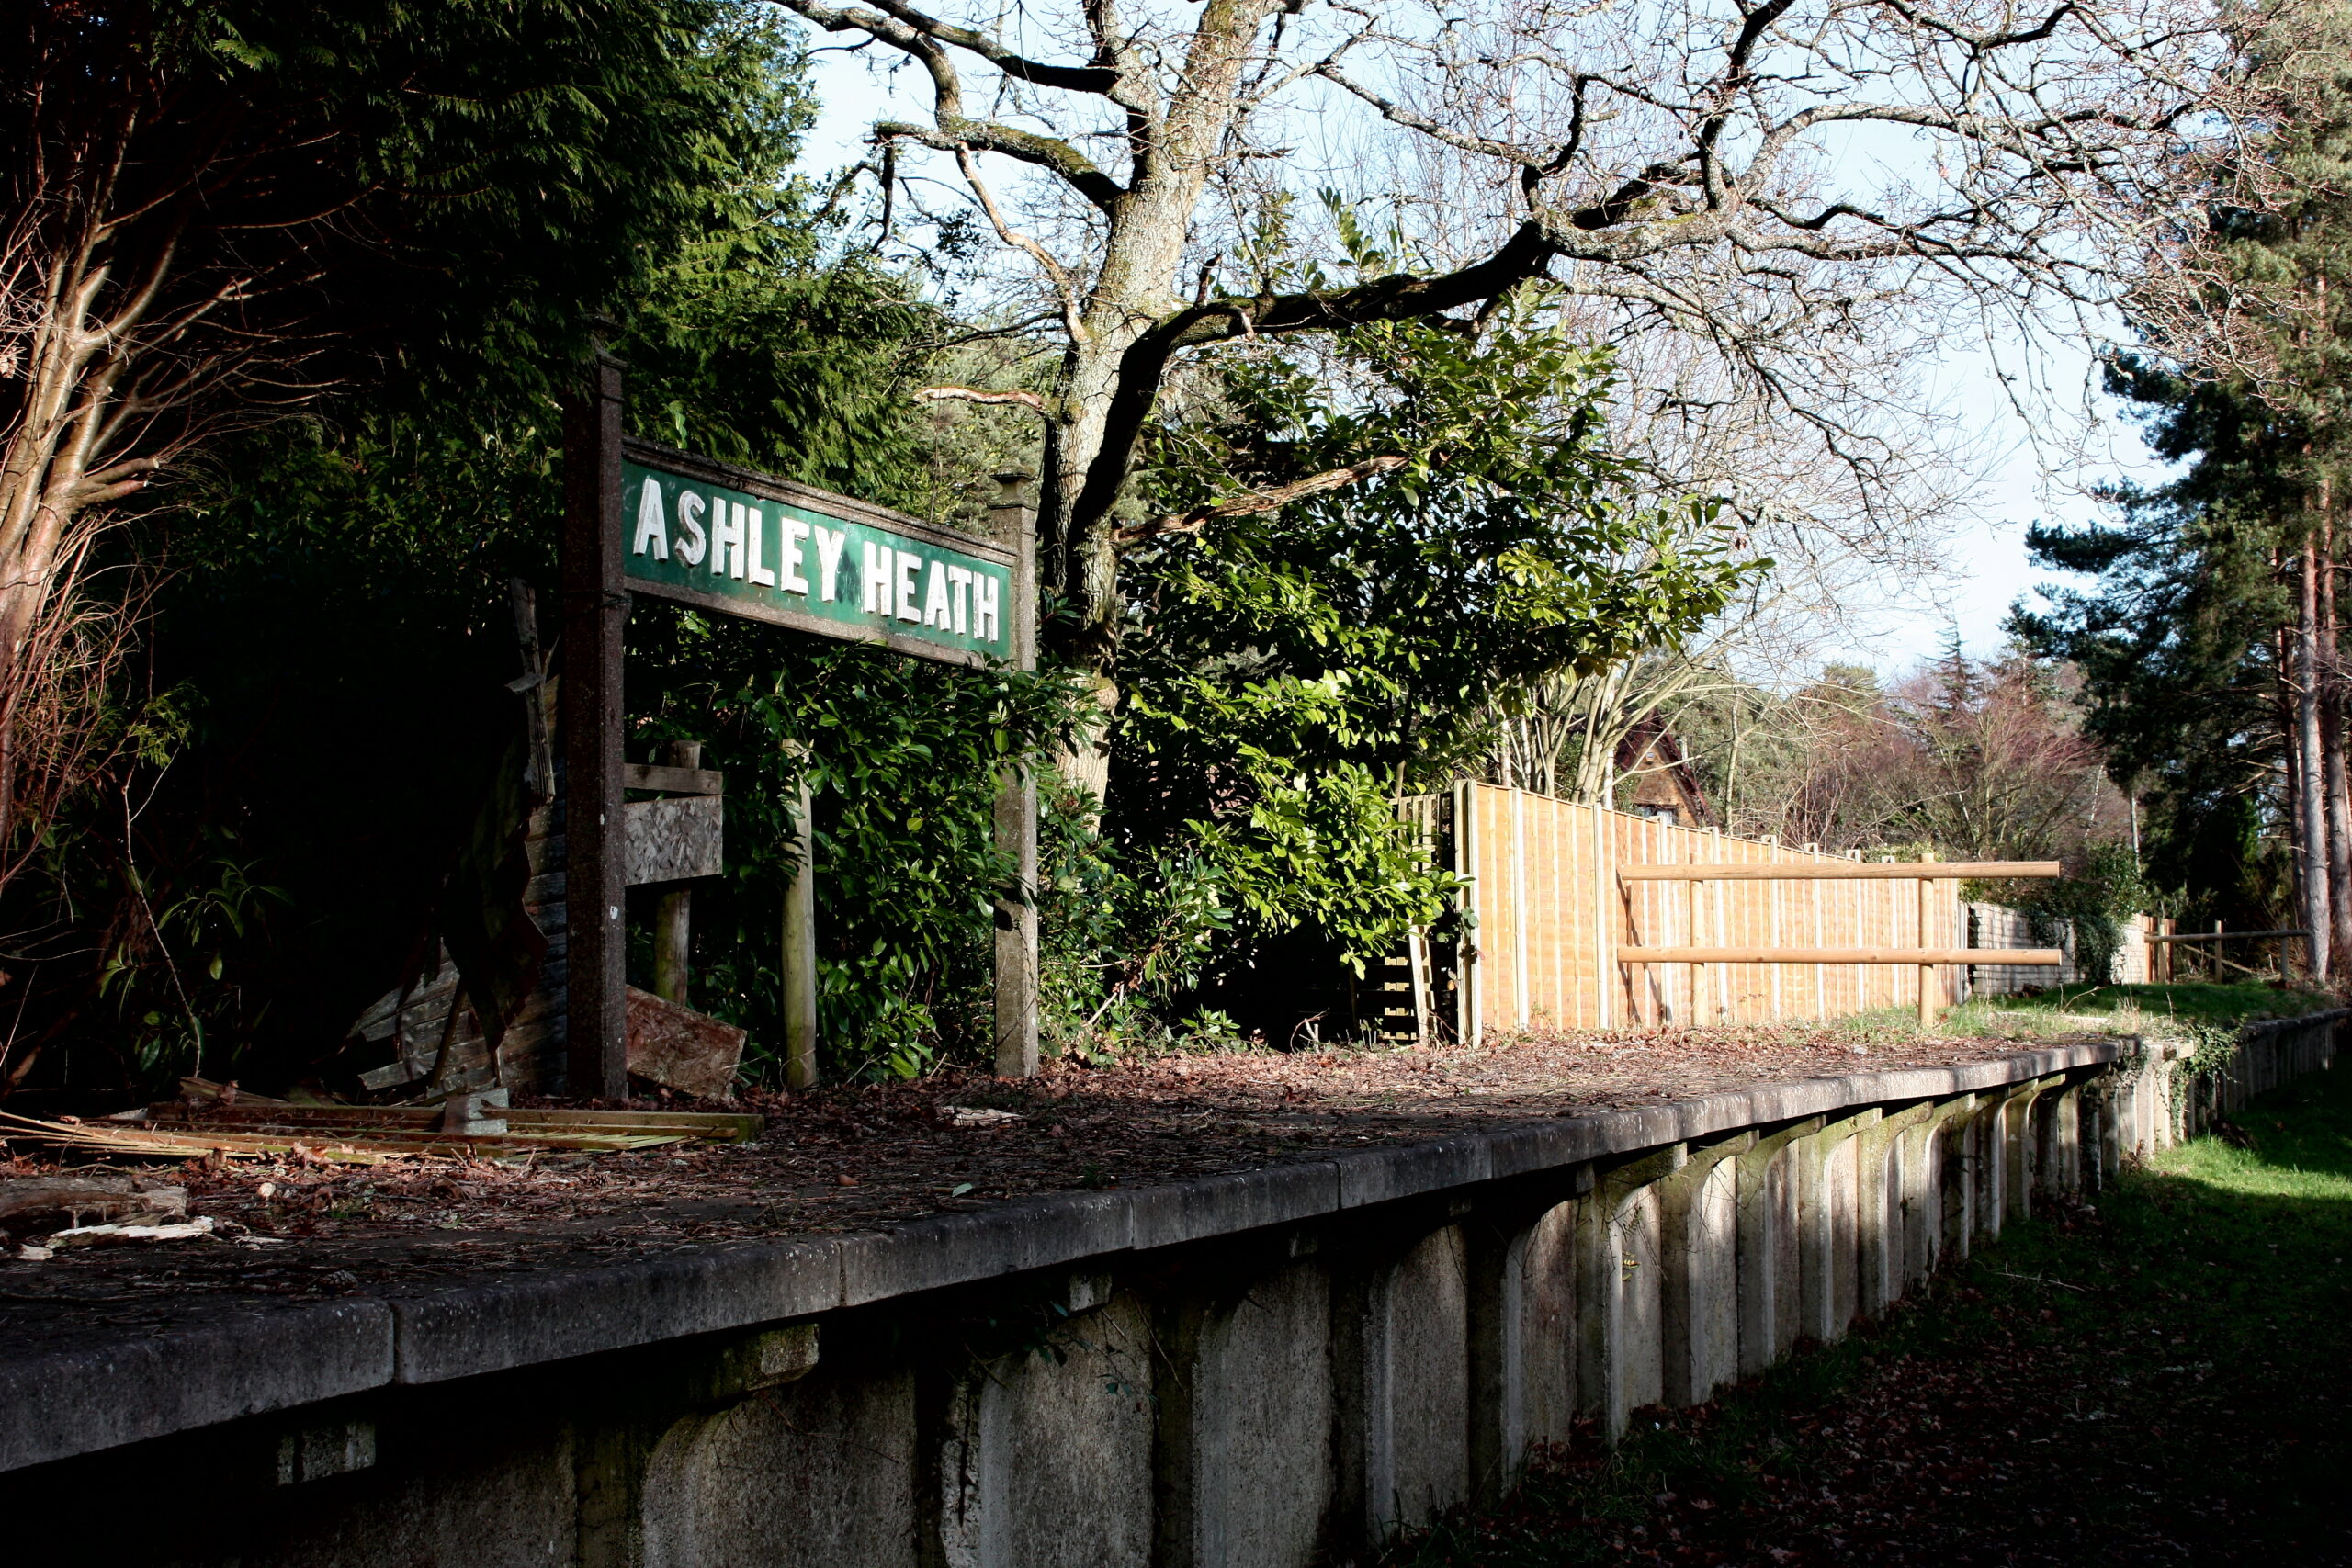 Ashley Heath Castleman Trailway | The Corkscrew Railway